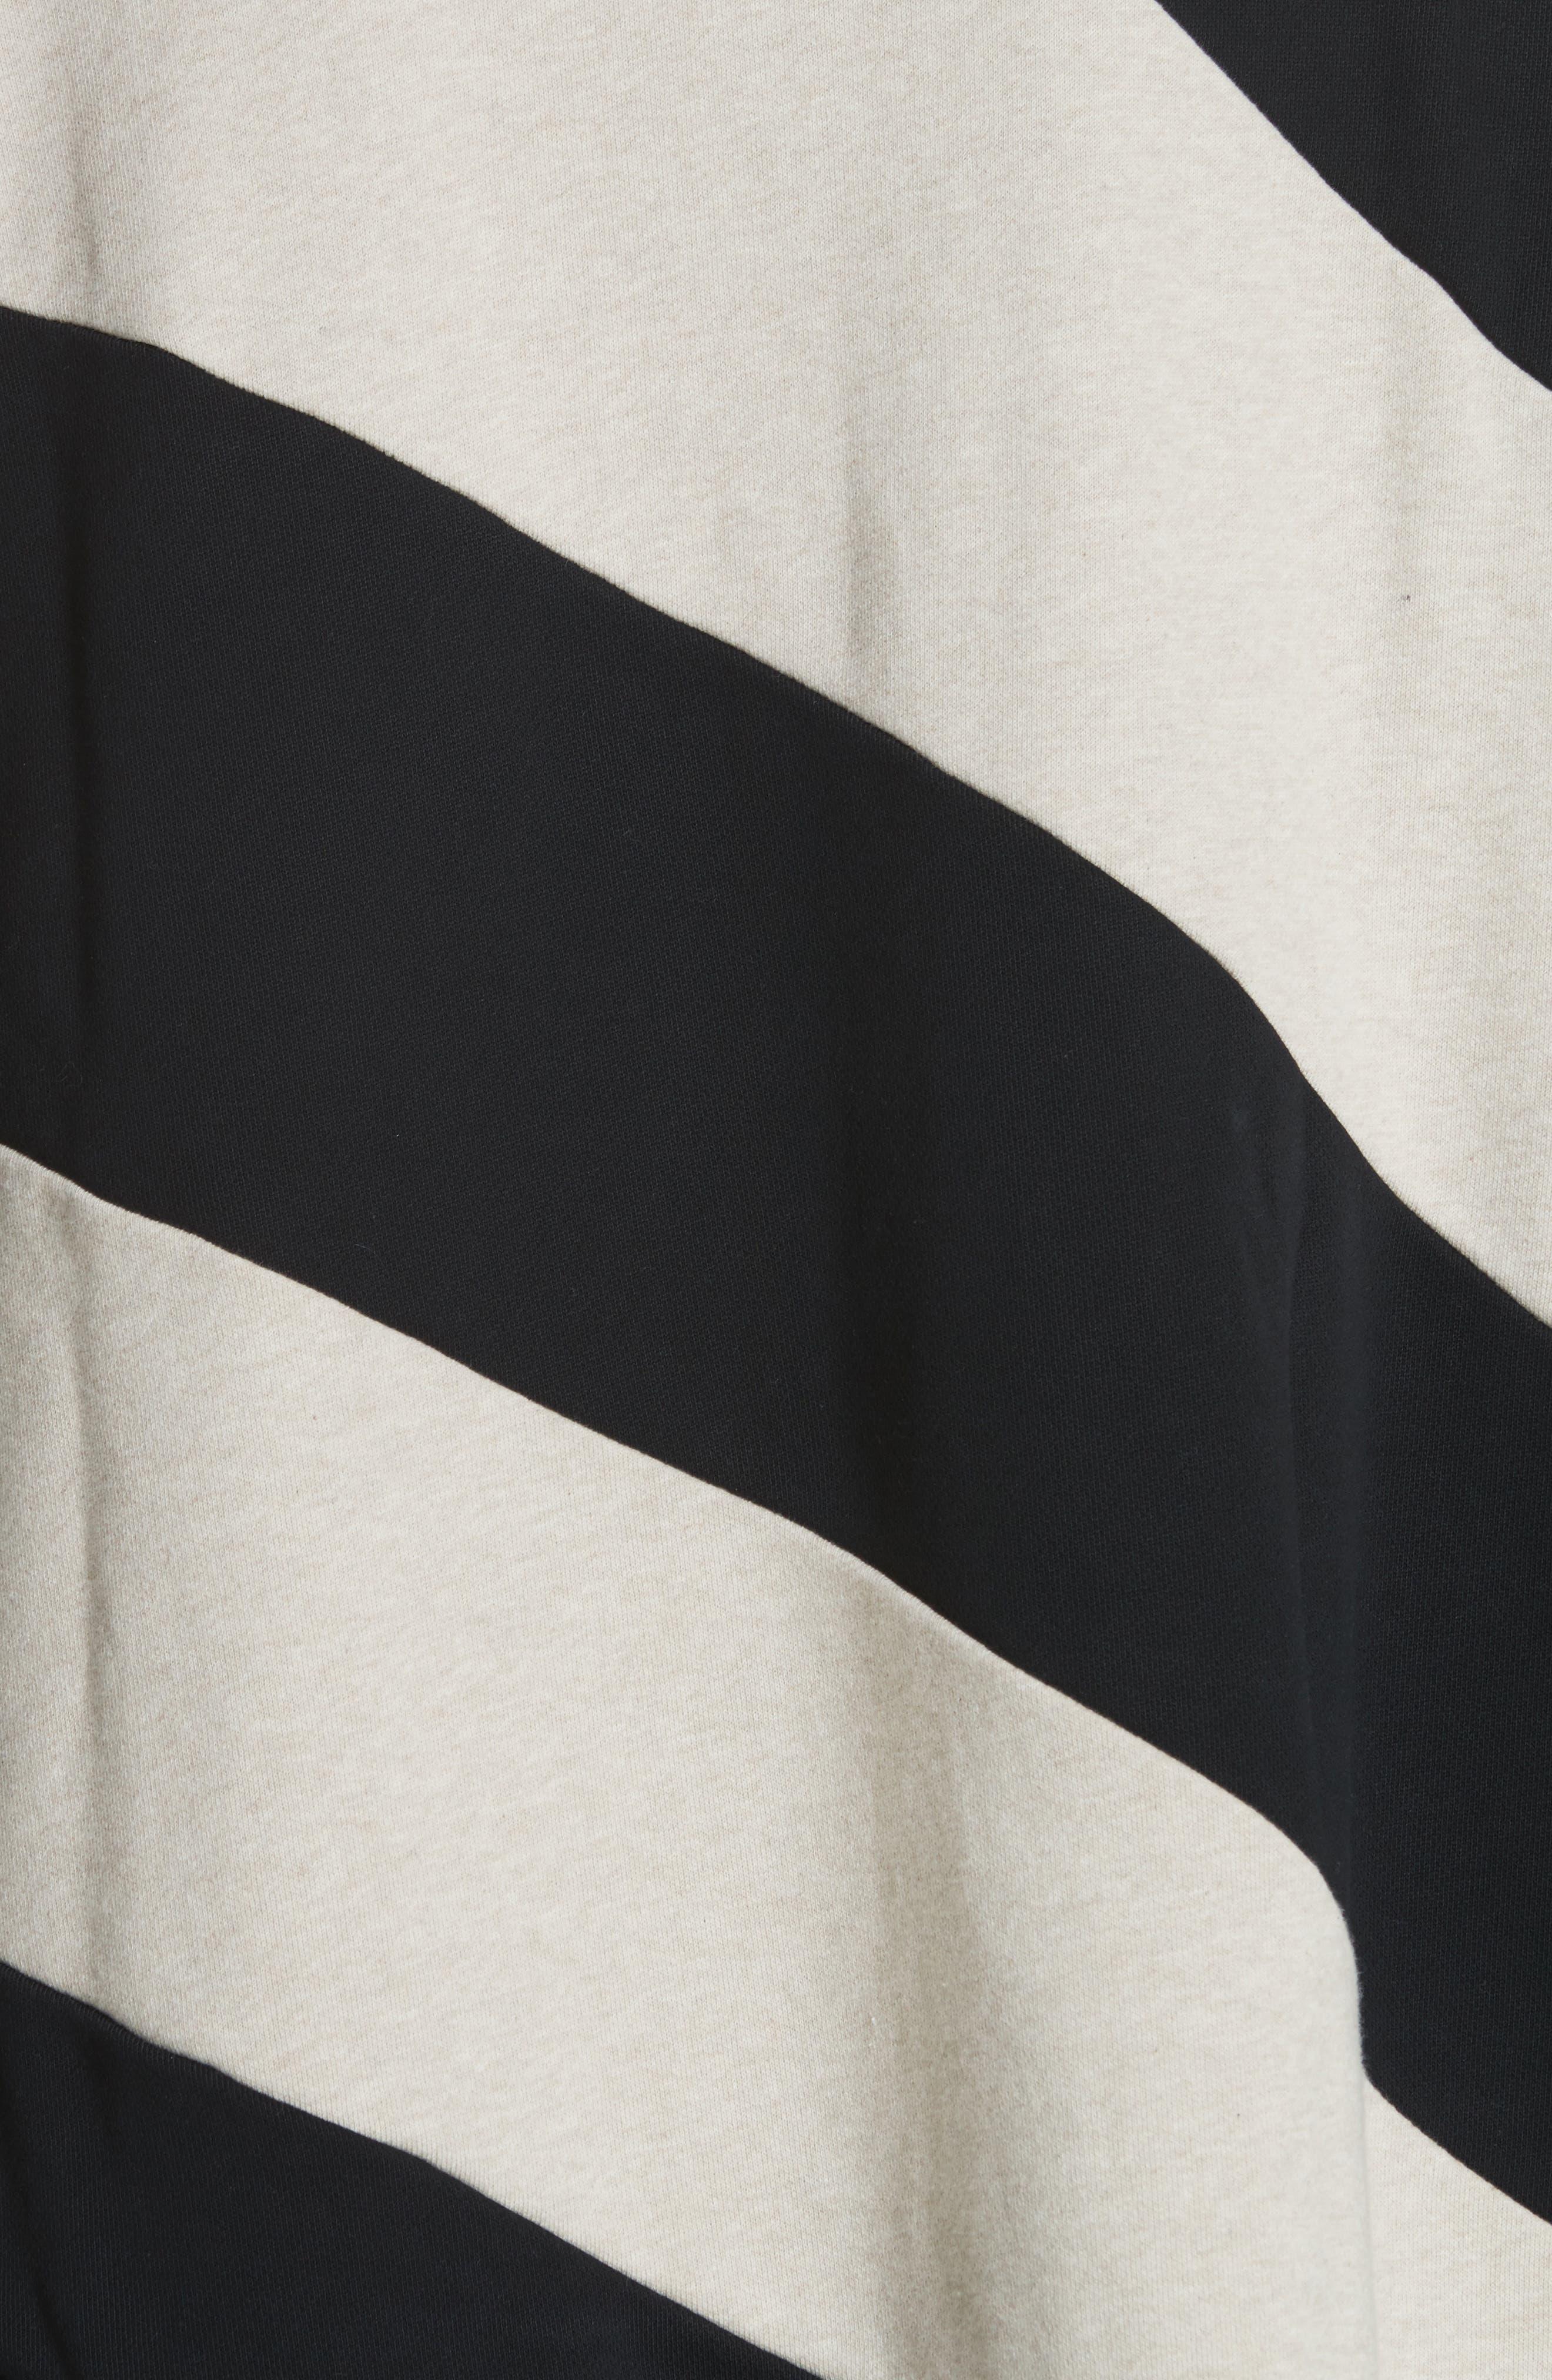 Marques'Almeida Asymmetrical Stripe Sweatshirt,                             Alternate thumbnail 5, color,                             250